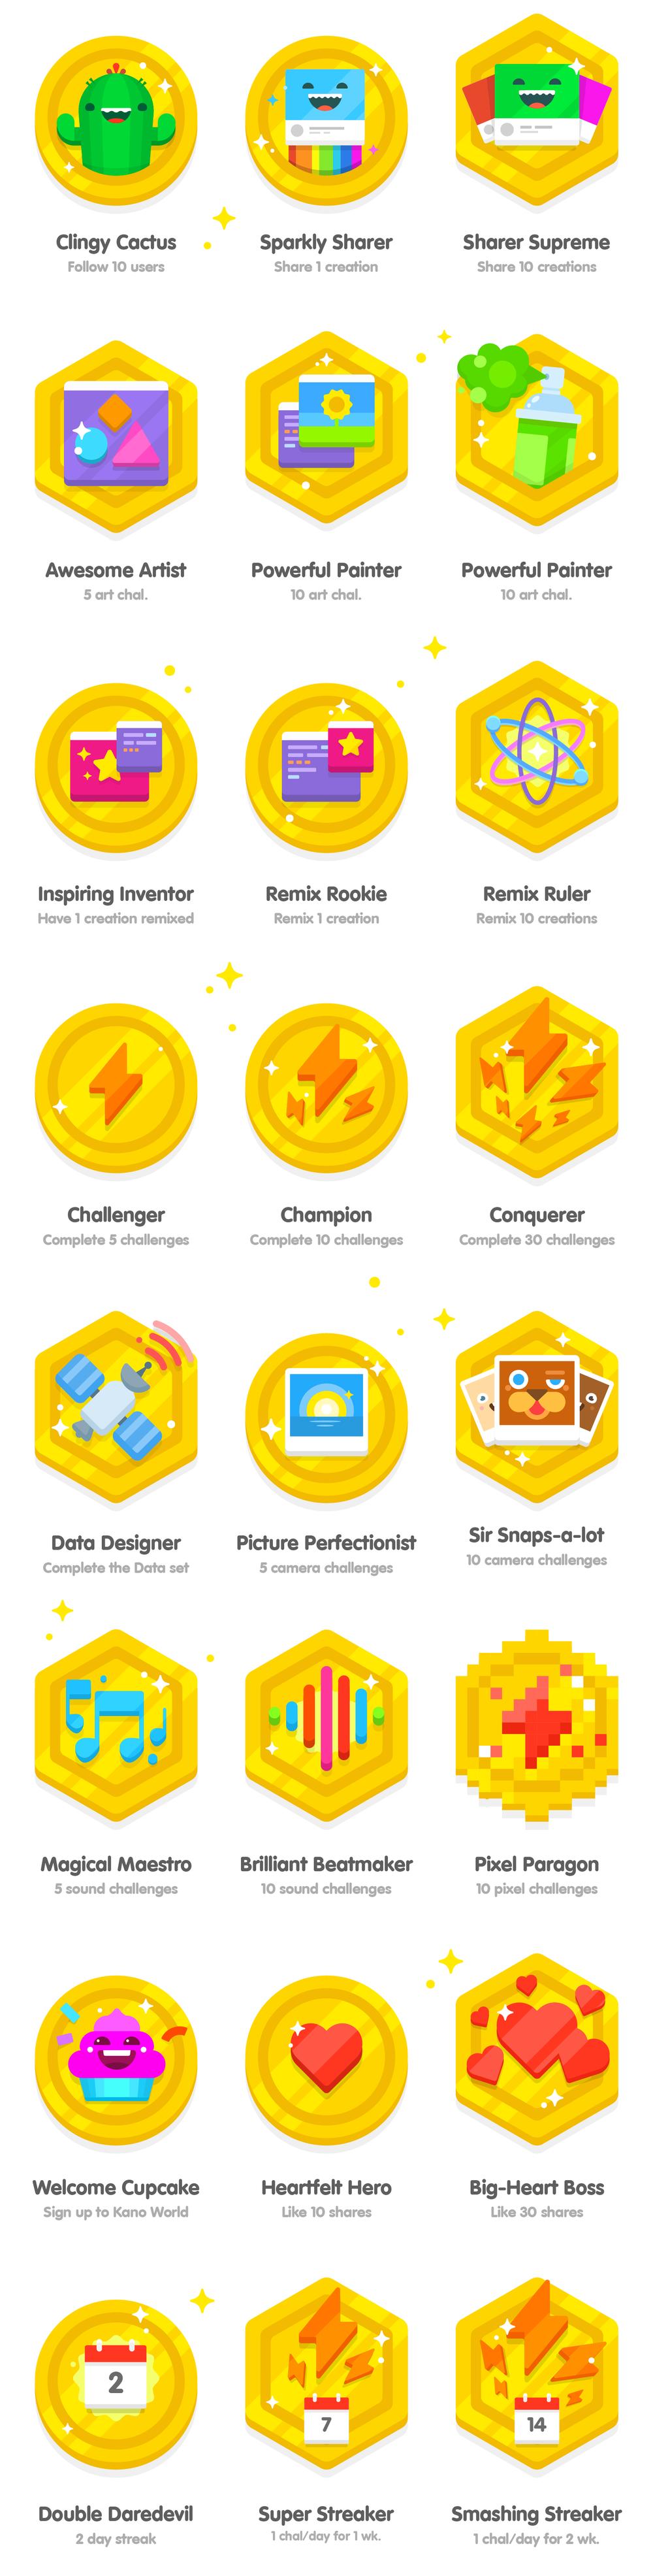 kano-badges-grid-68.png